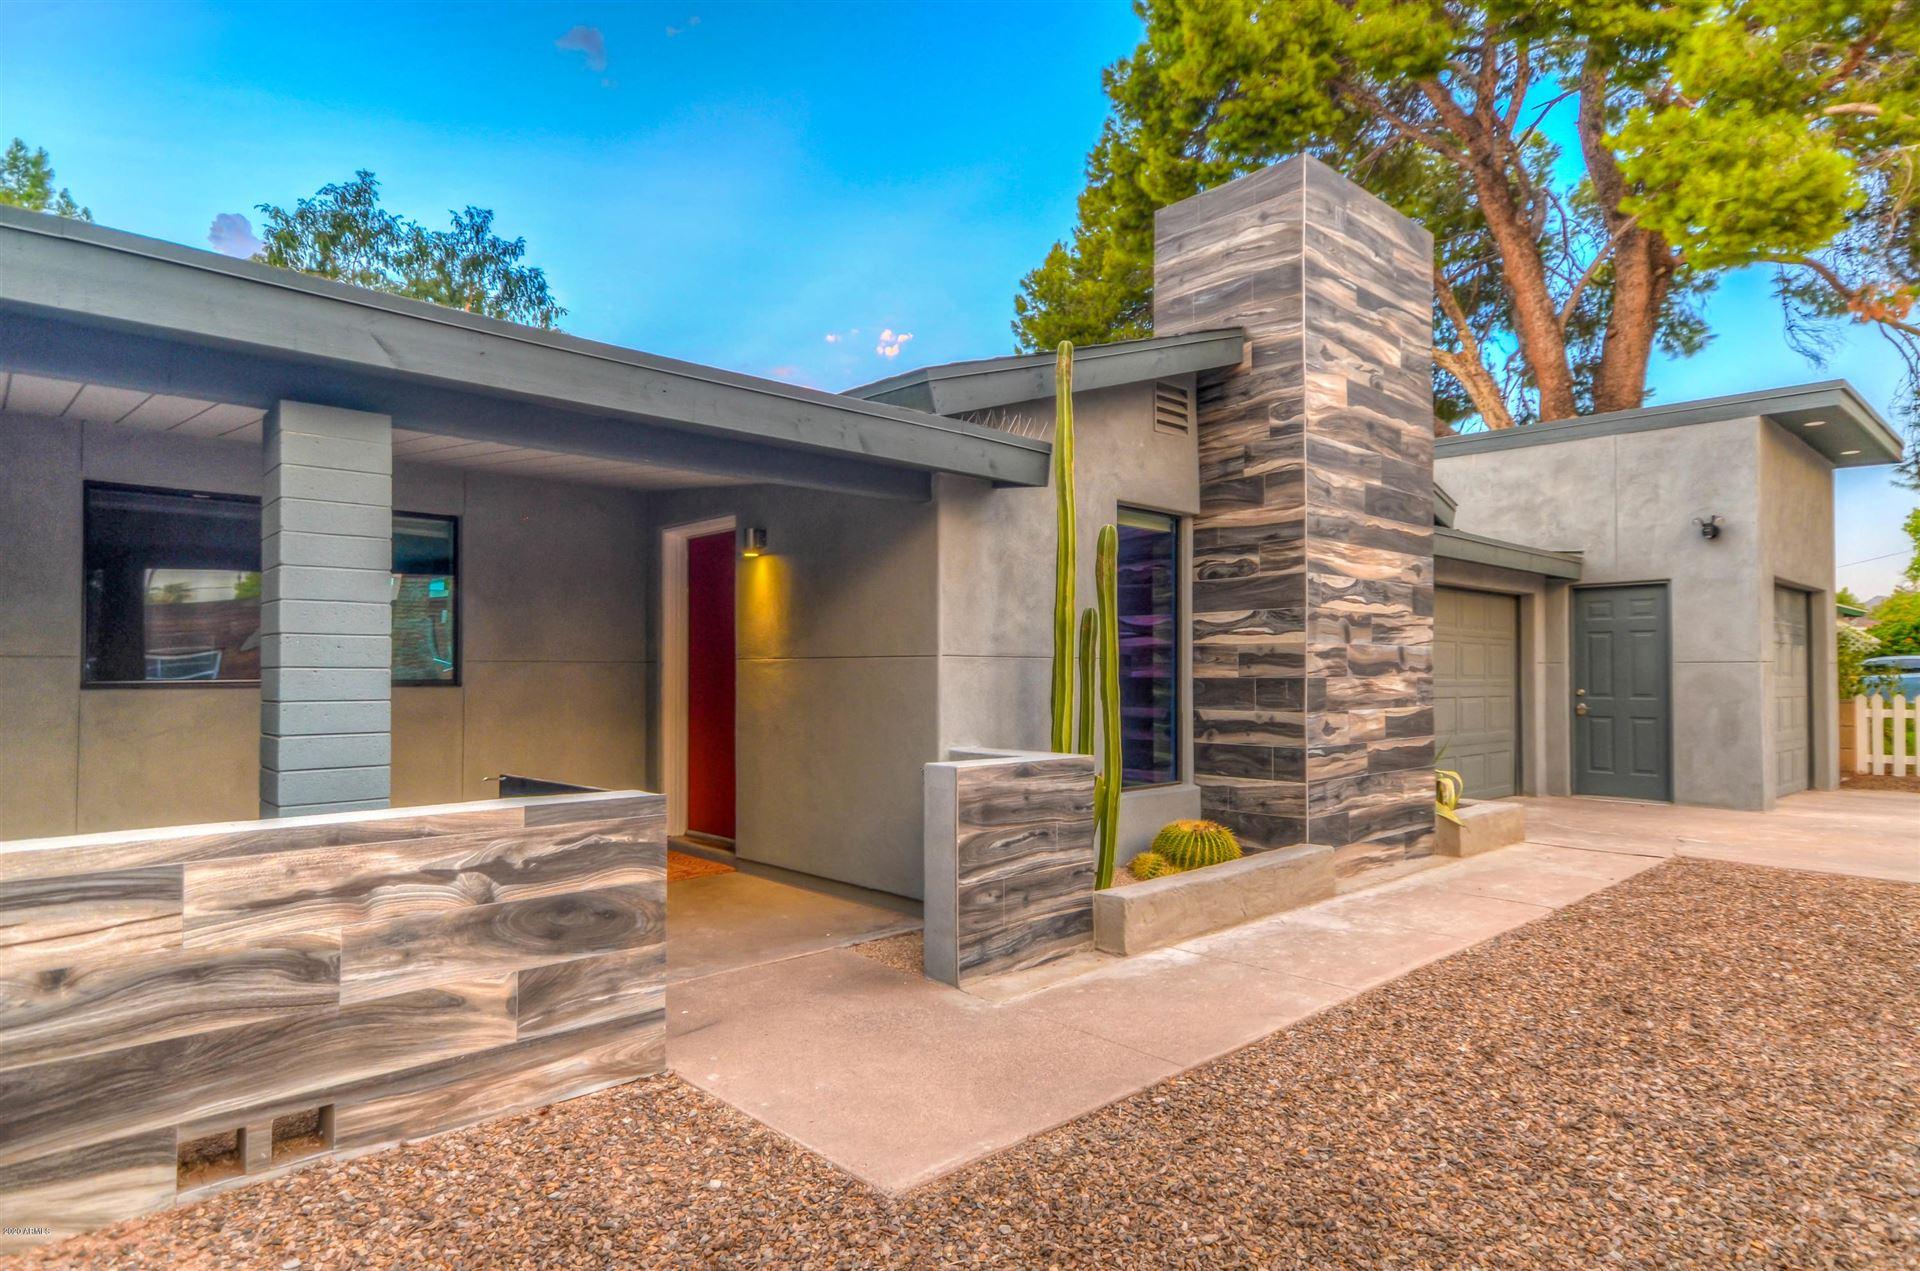 4132 N 34TH Place, Phoenix, AZ 85018 - MLS#: 6108171